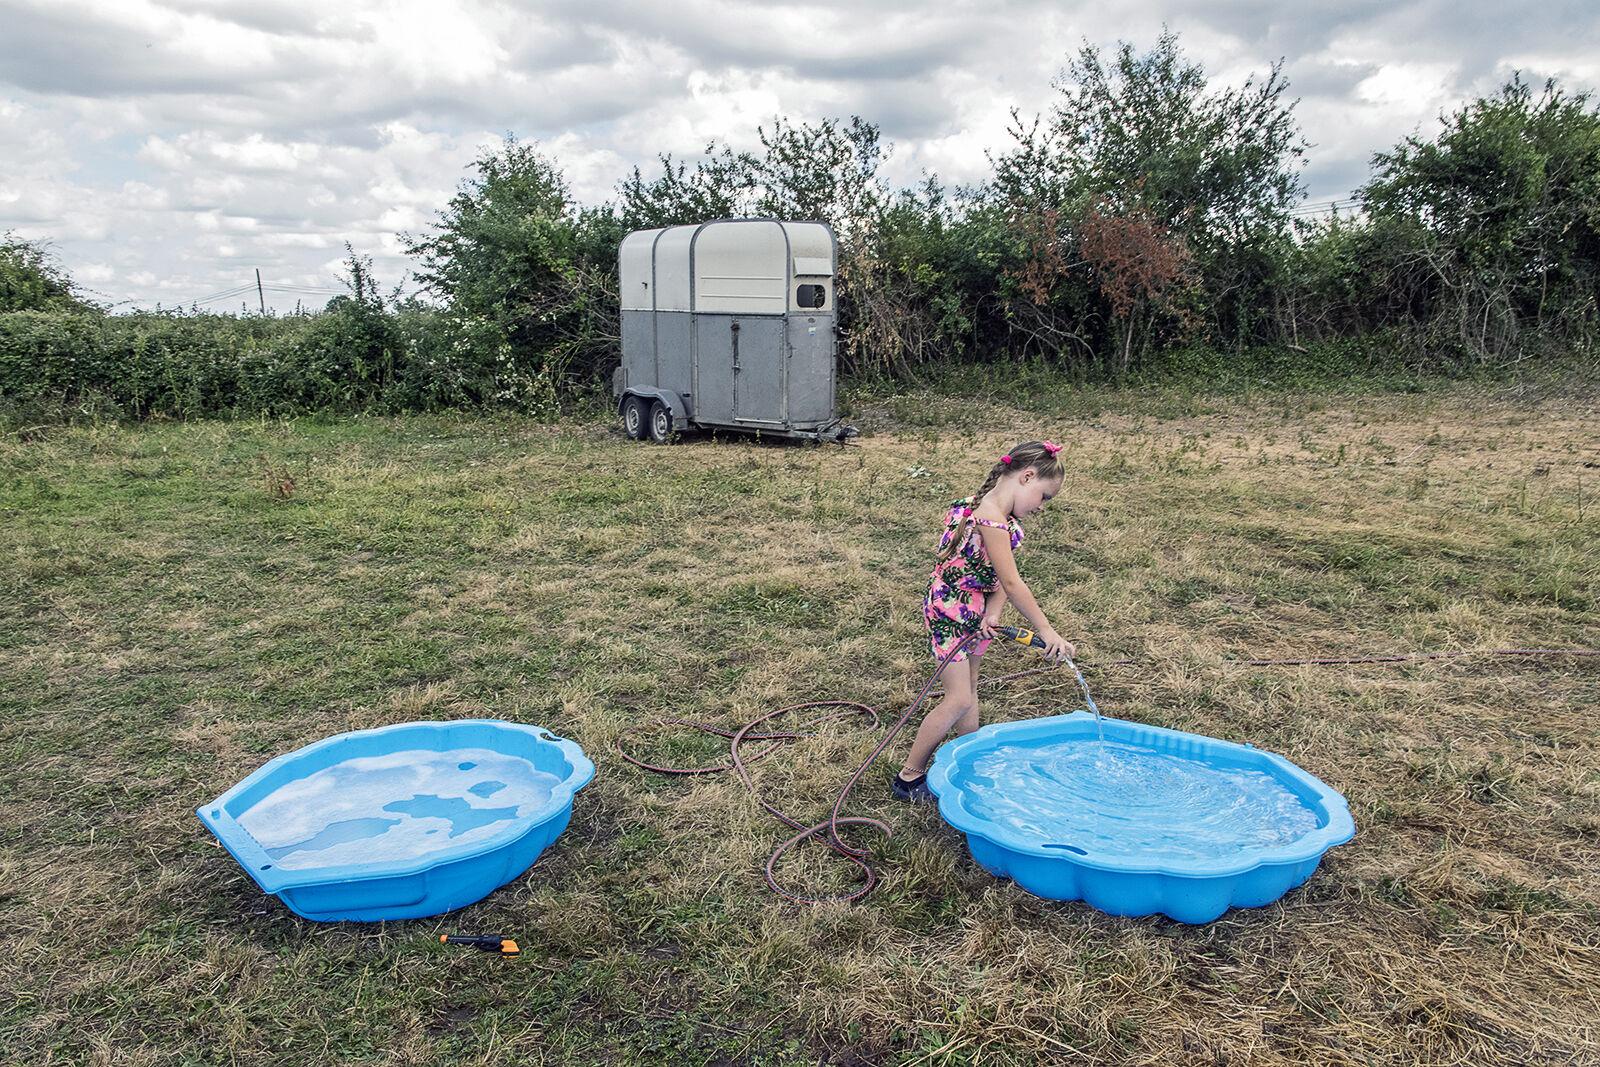 Two Pools, roadside campsite, Limerick, Ireland 2018